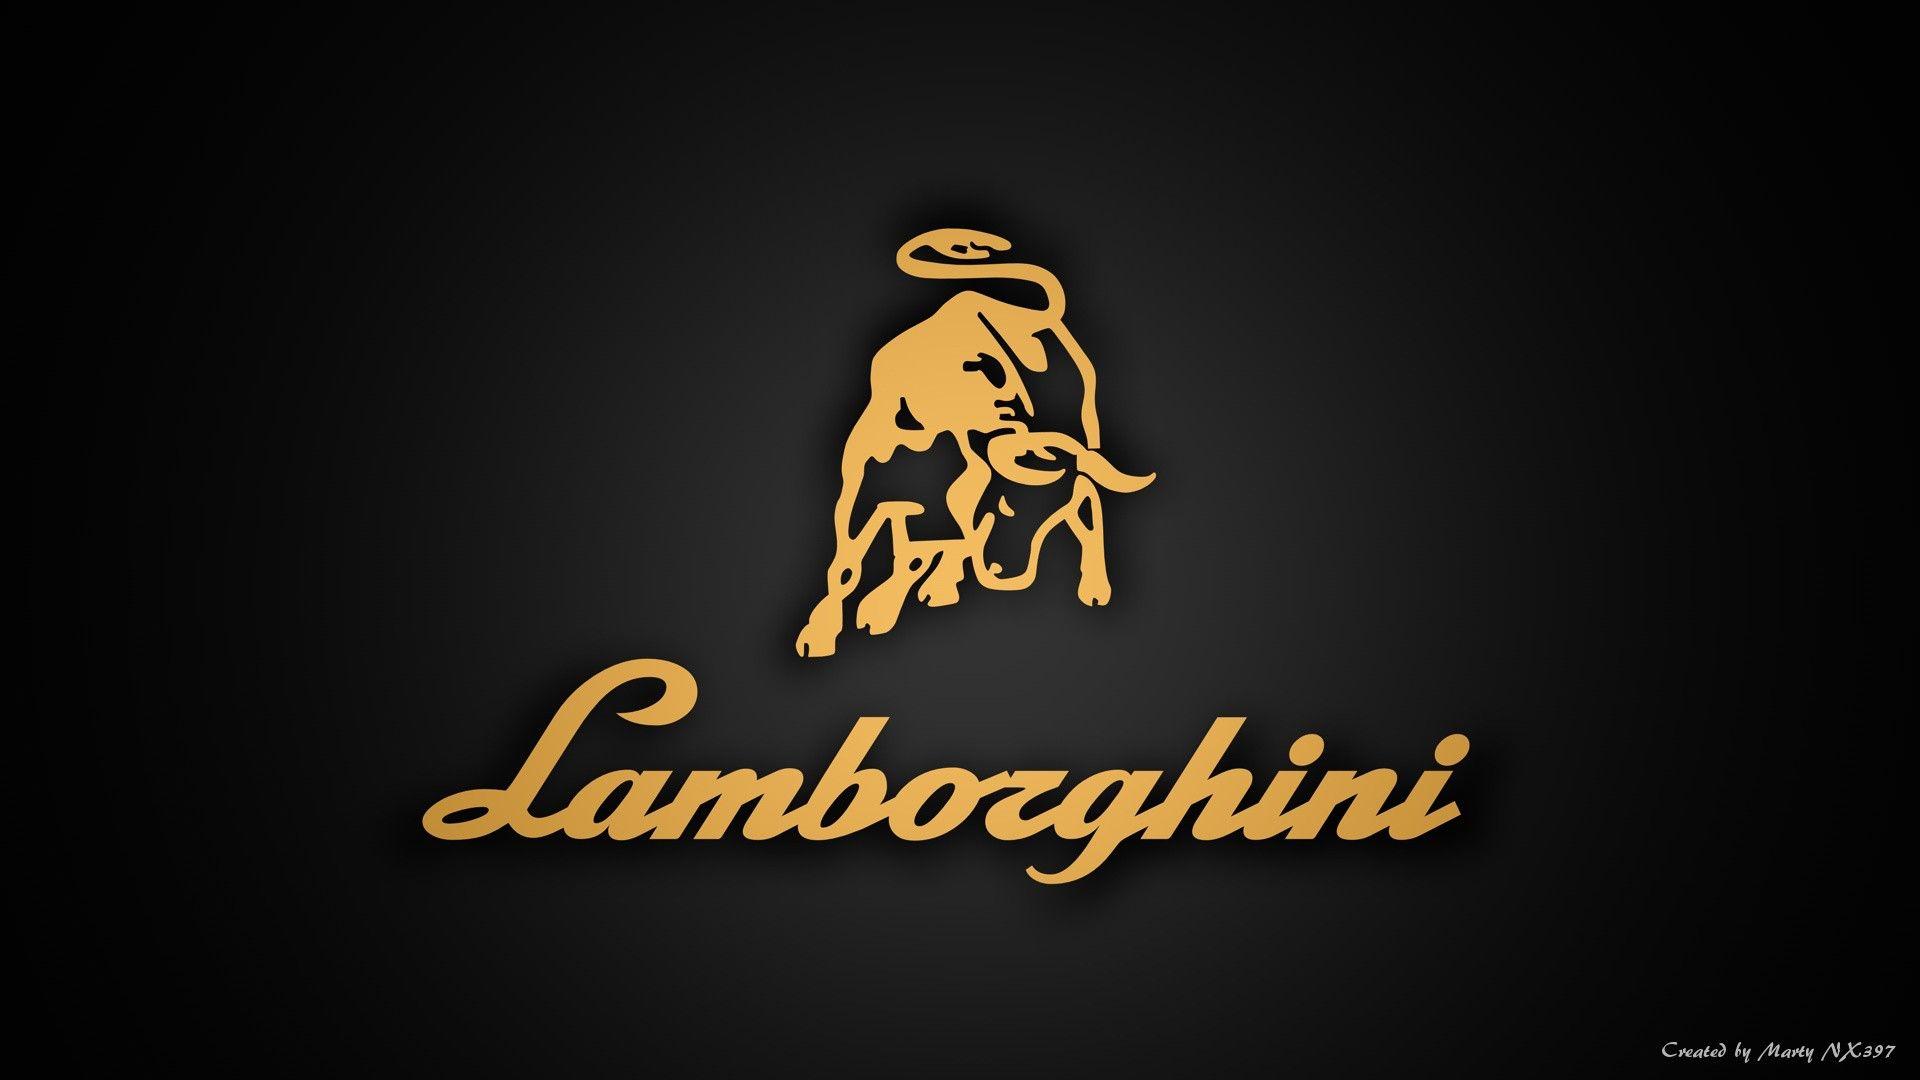 hd lamborghini logo Pictures Of Cars Hd 6401136 Lamborghini Logo 1920x1080